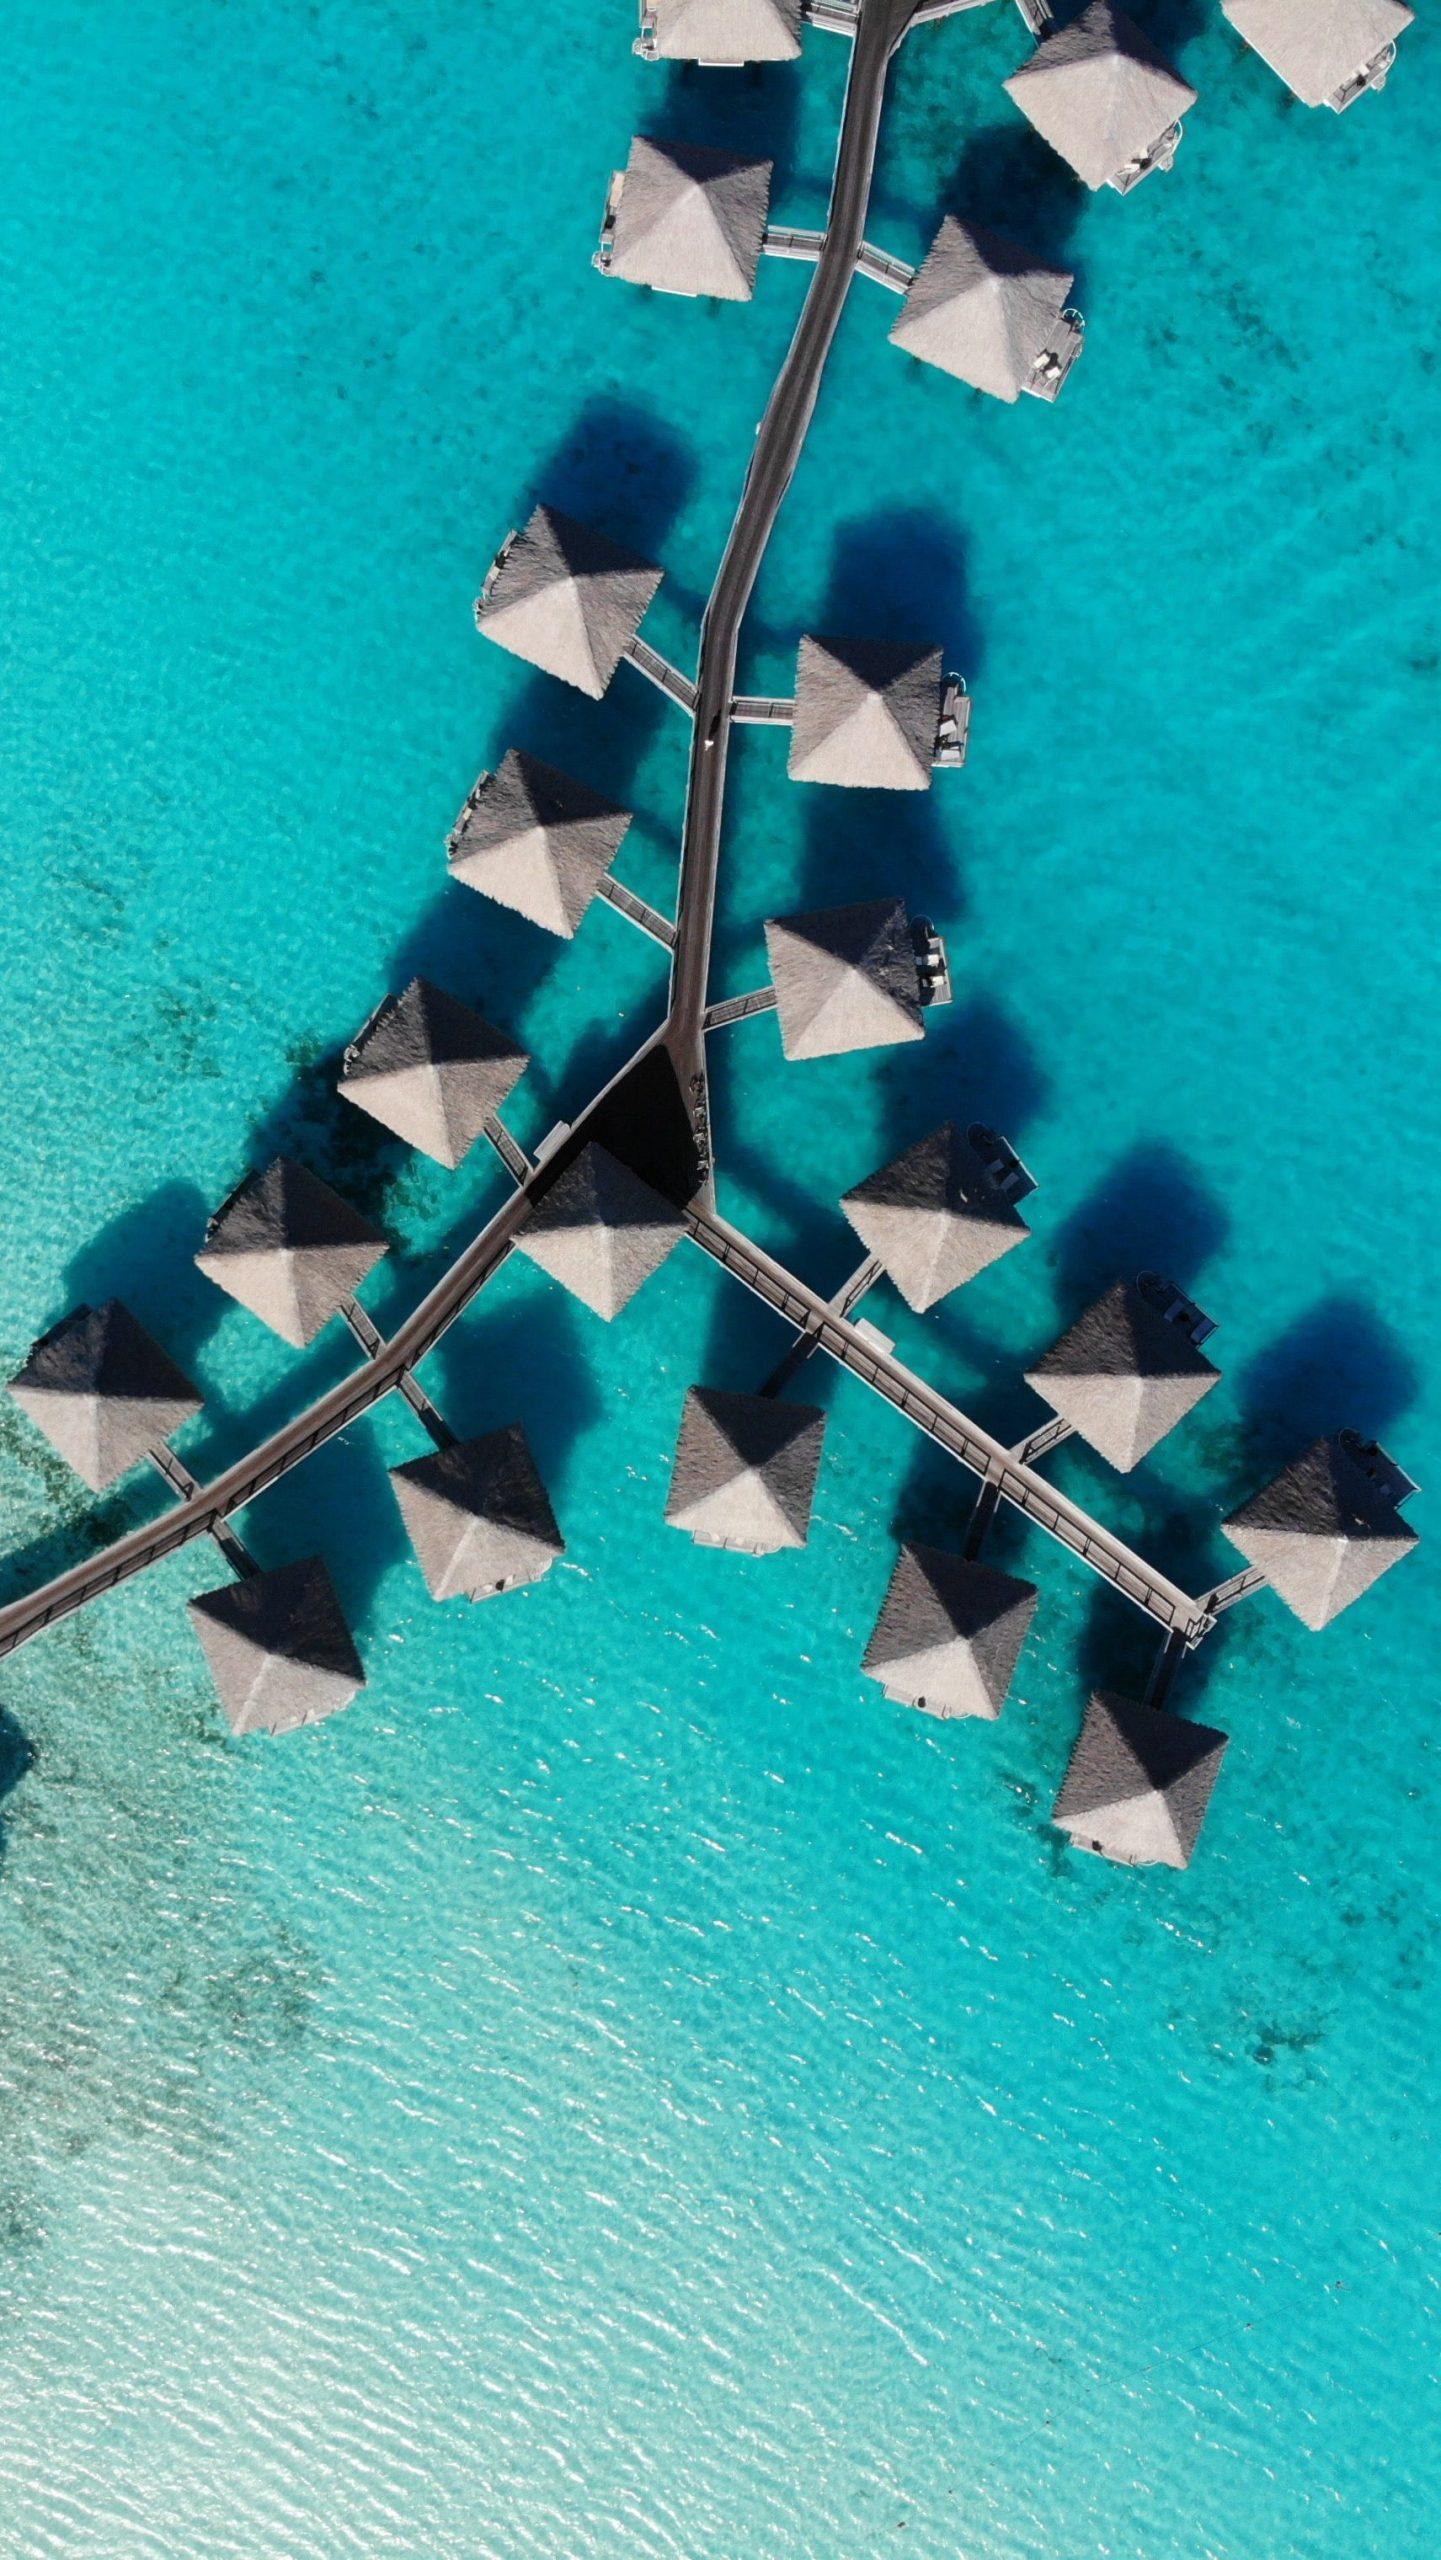 A haven for billionaires